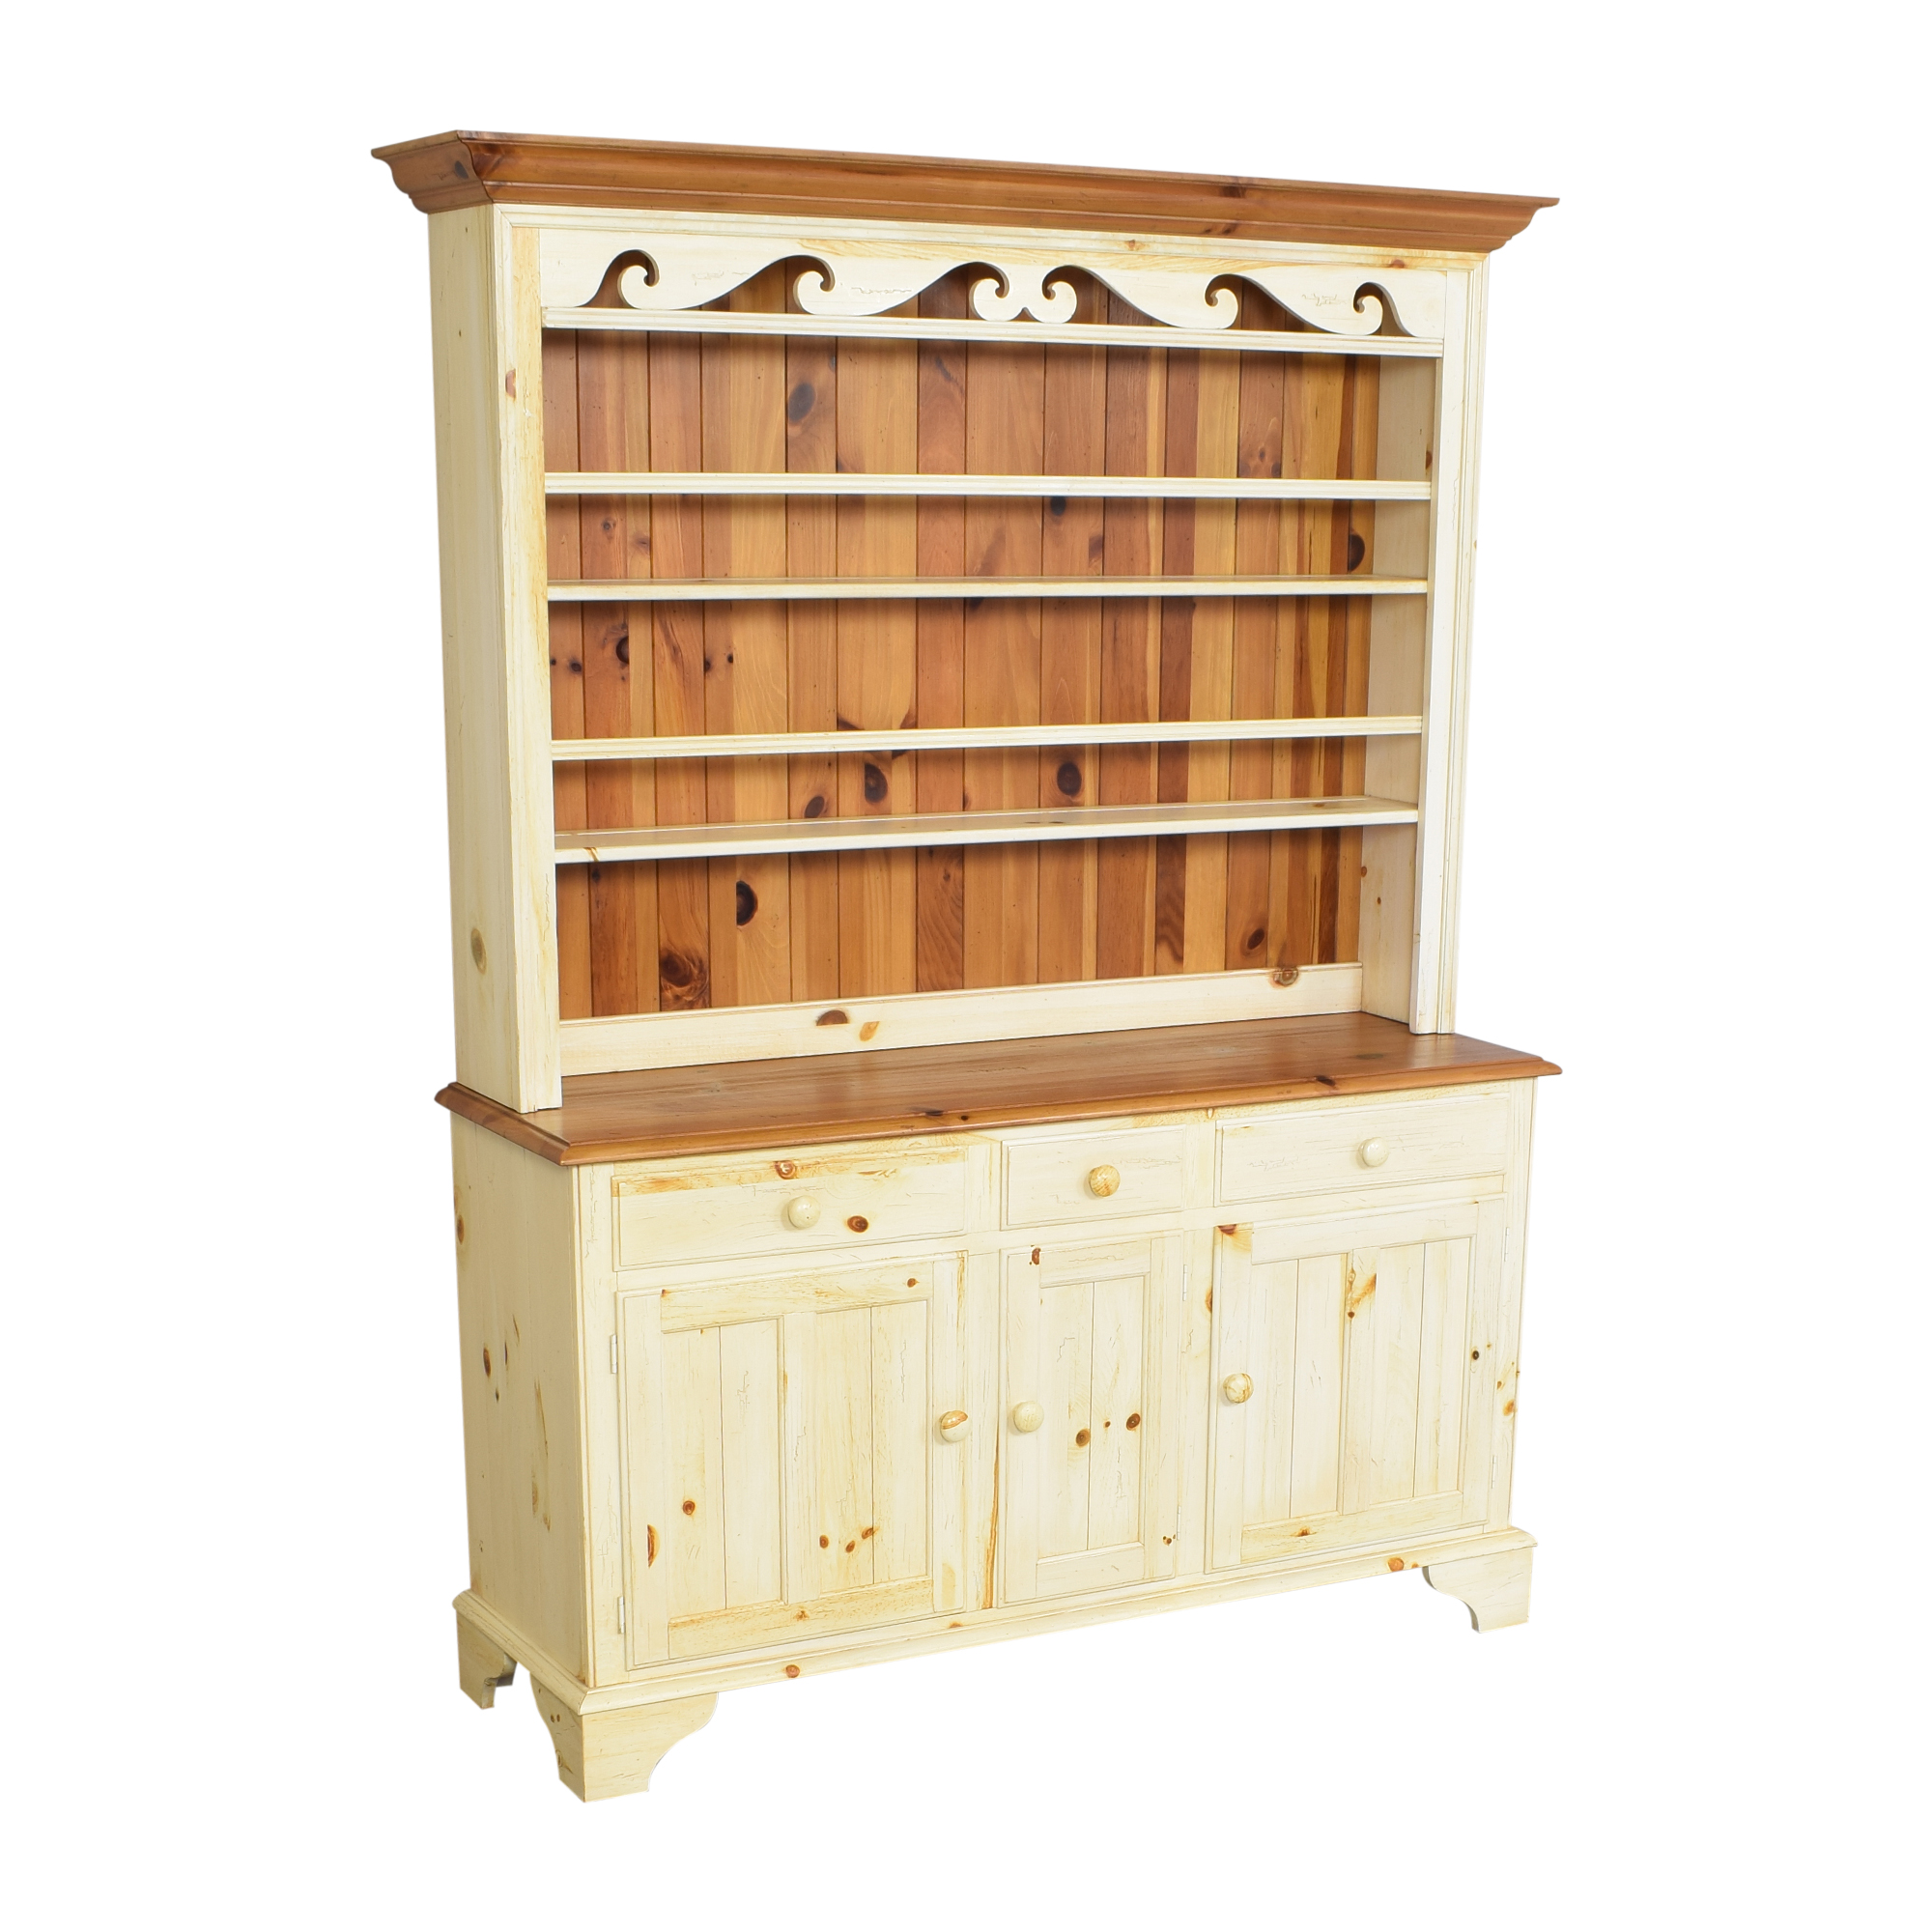 Ethan Allen Ethan Allen Farmhouse Cabinet with Hutch coupon